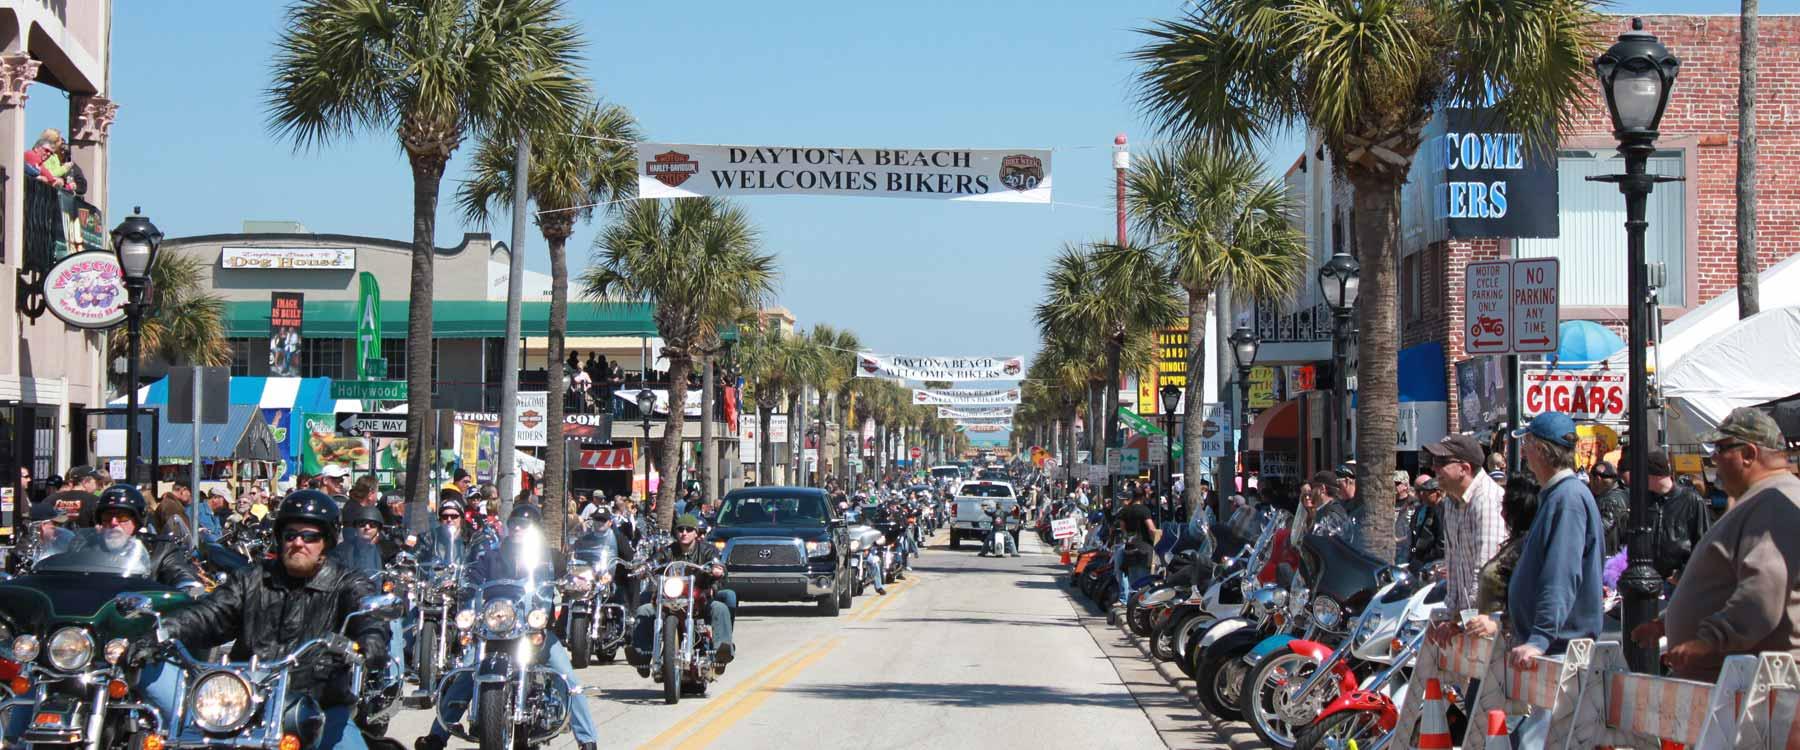 Photo of Daytona Bike Week